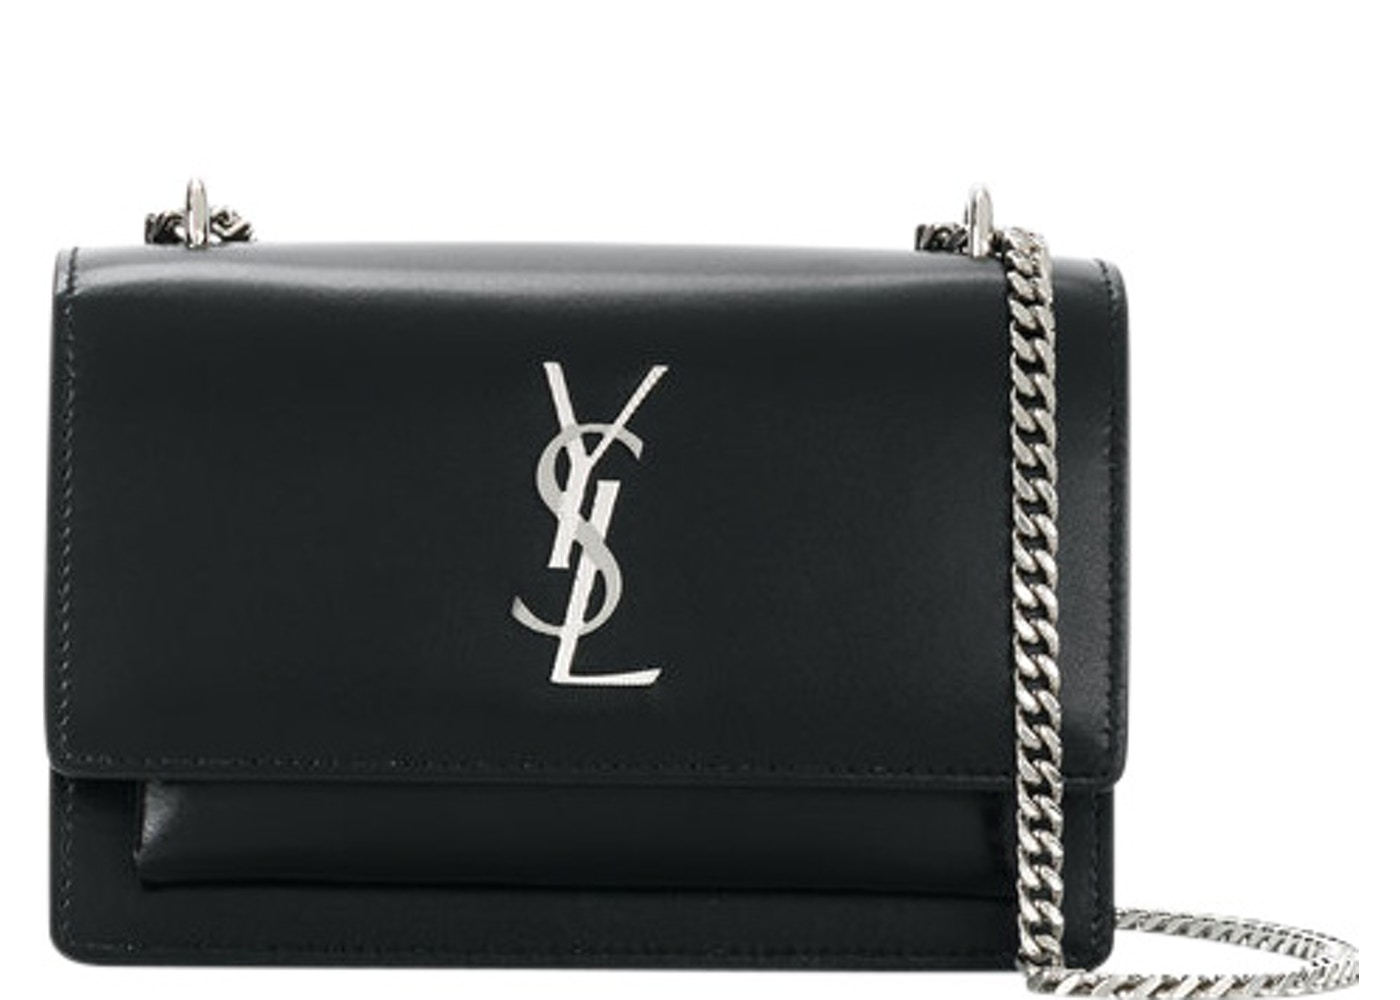 d711222b3ea46 Buy & Sell Saint Laurent Luxury Handbags